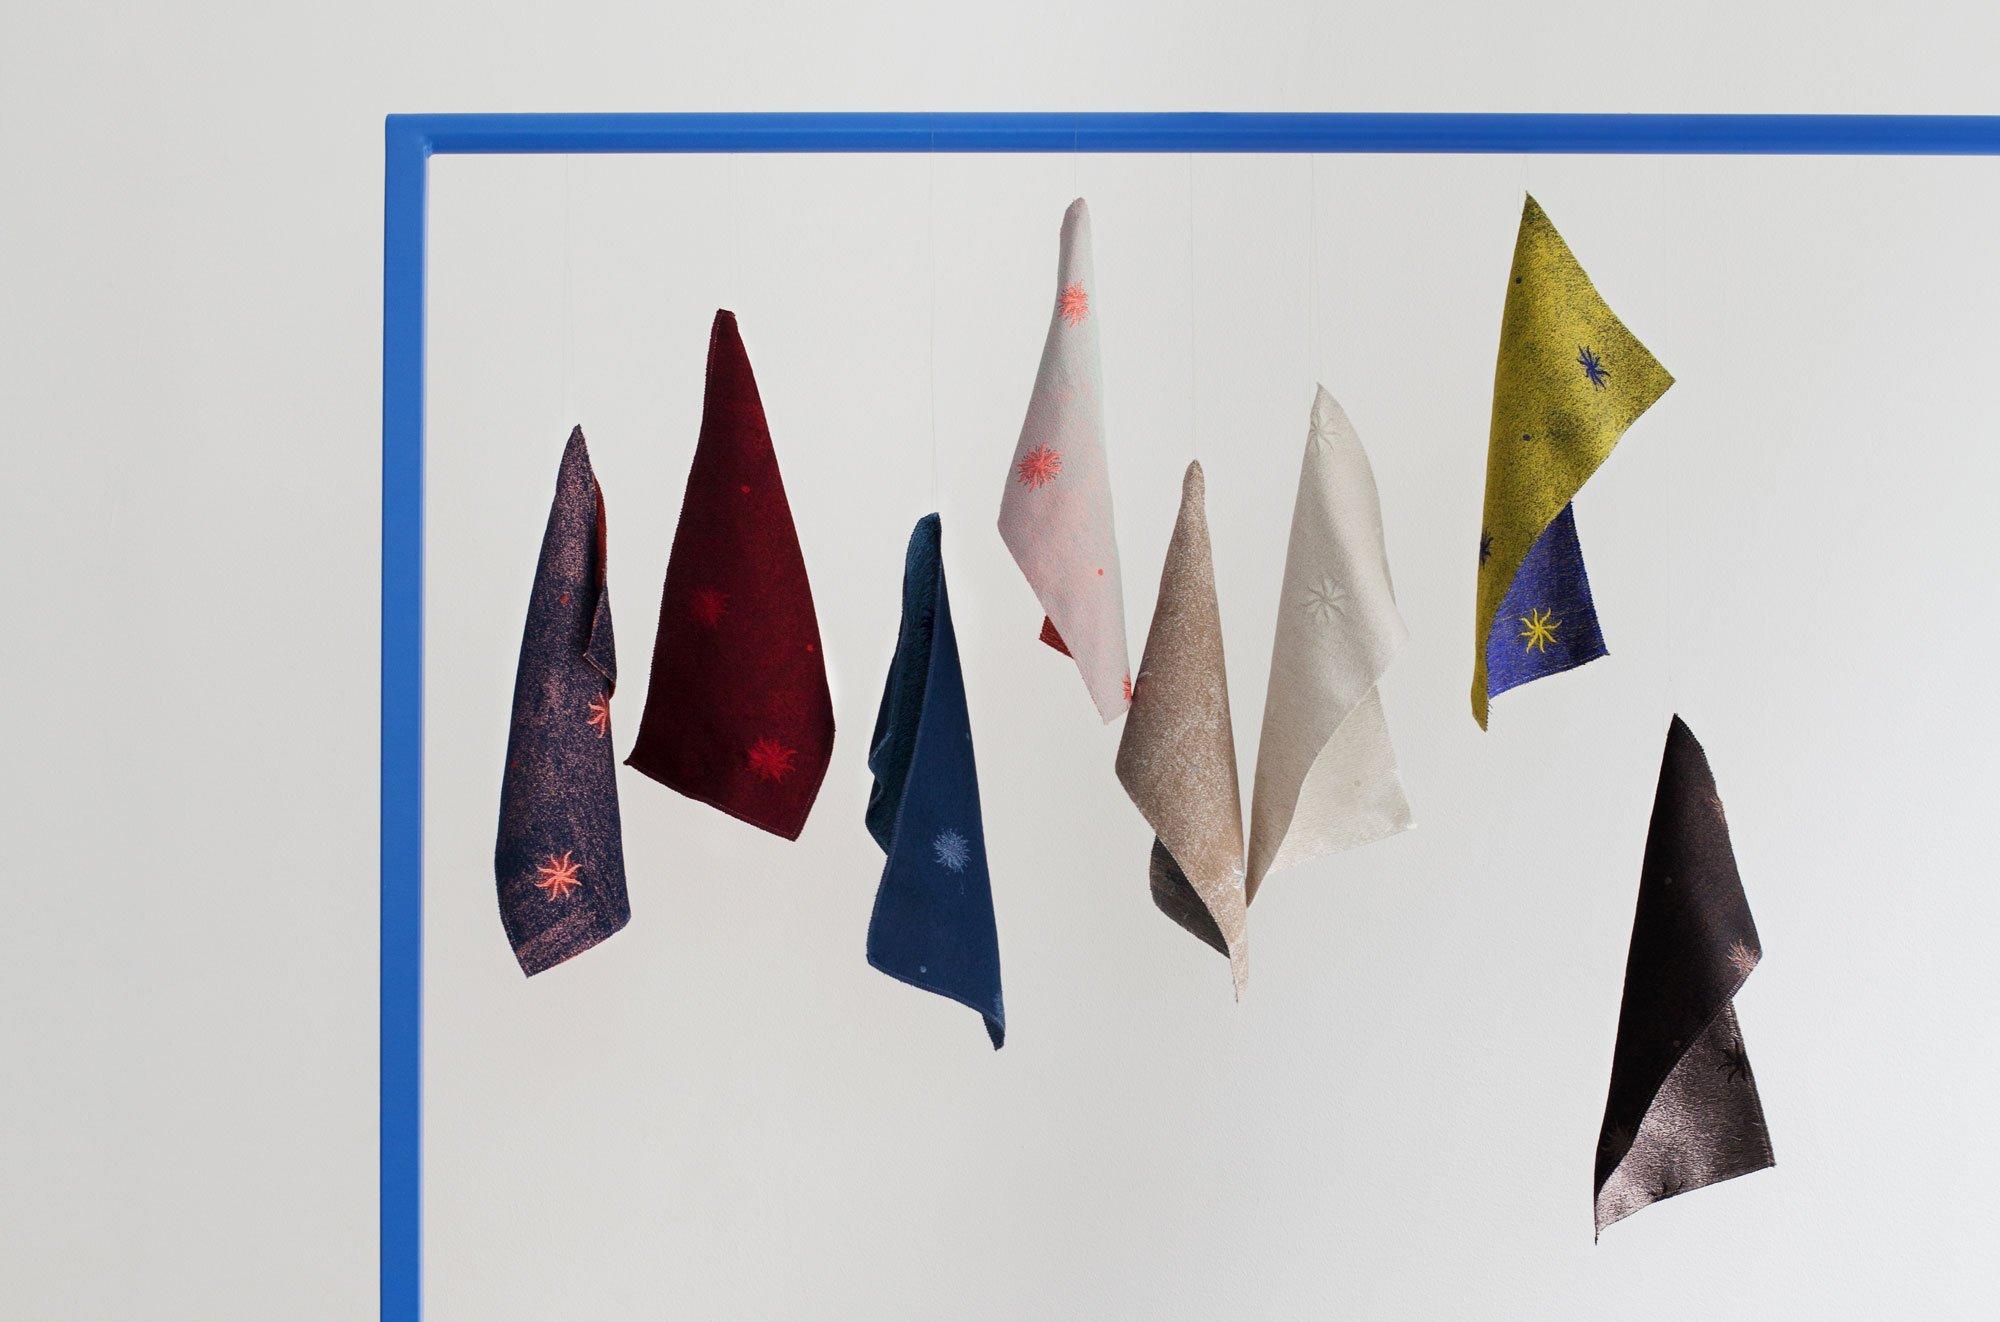 Farbenfrohe Stoffe von Luca Nichetto für Rubelli